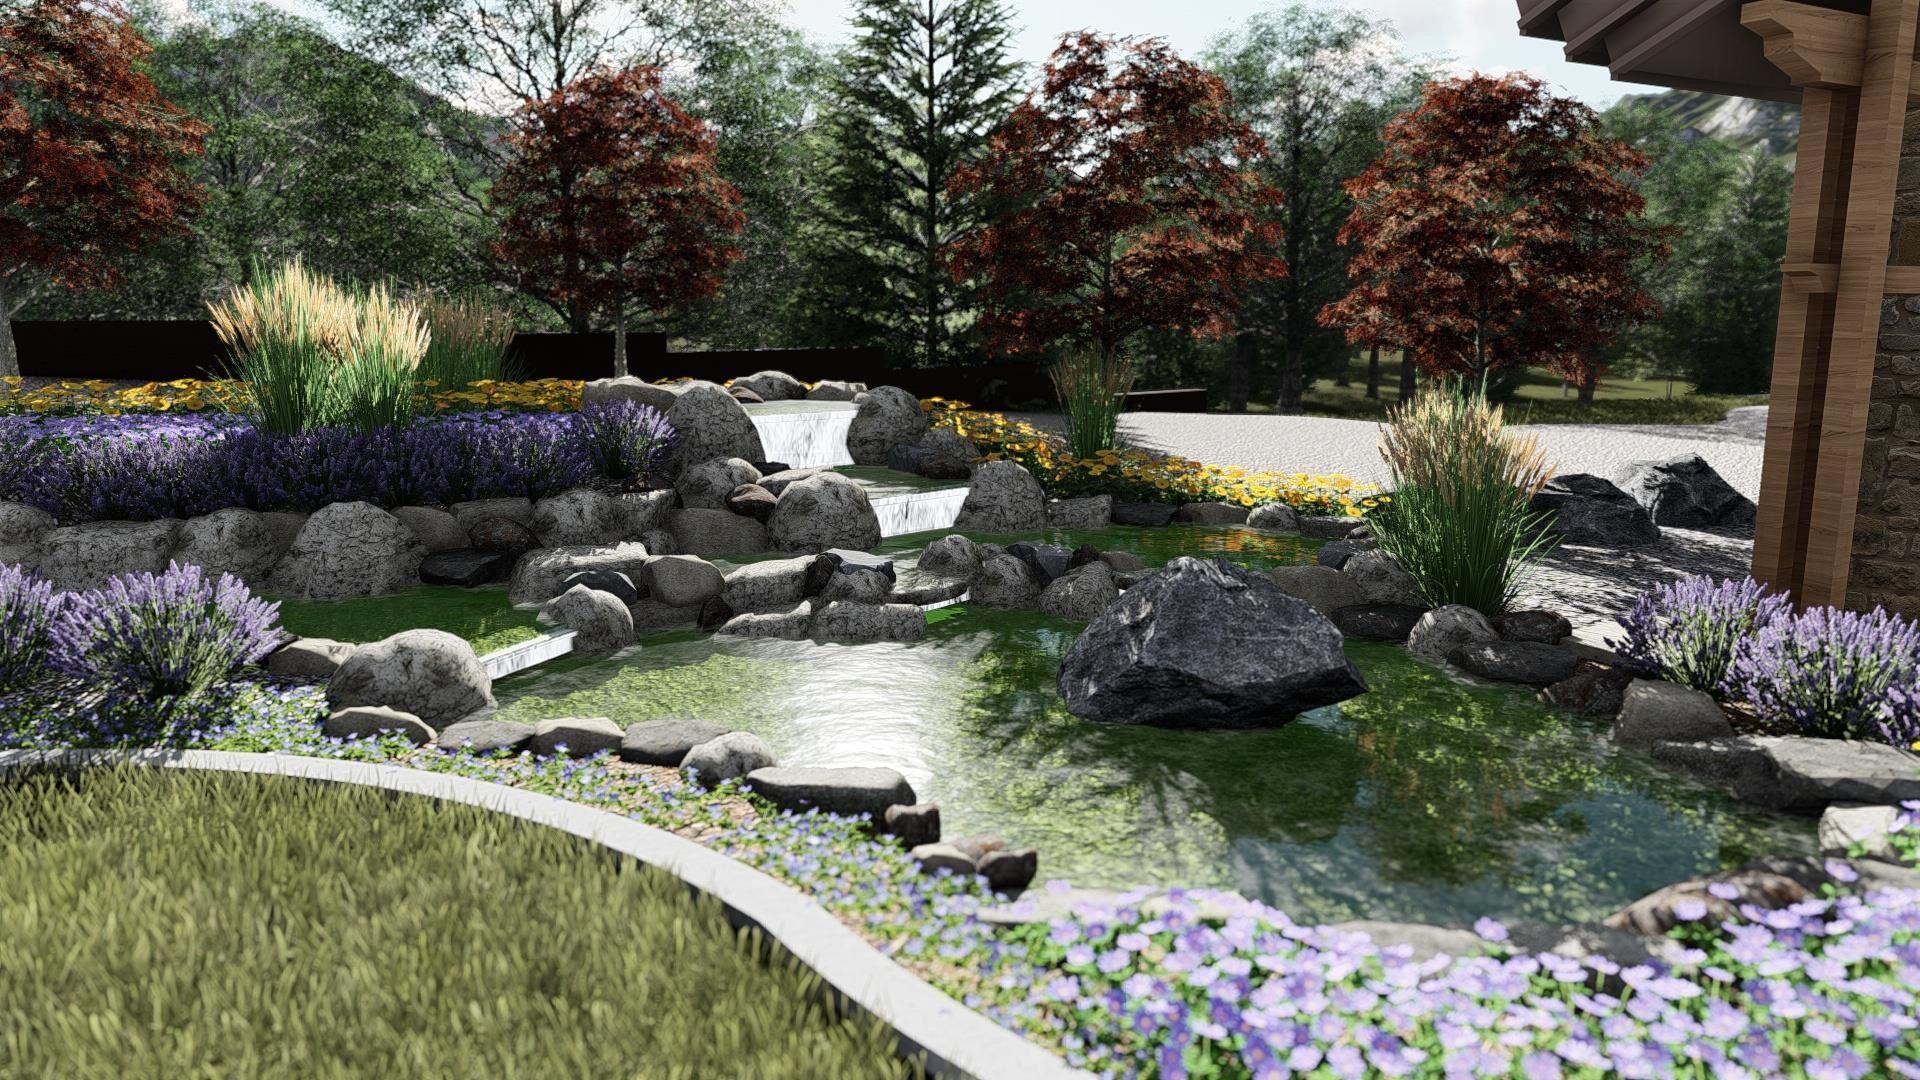 Pin By Matt Hiner On Landscape Plans Renderings Landscape Design Tropical Landscape Design Landscaping Images